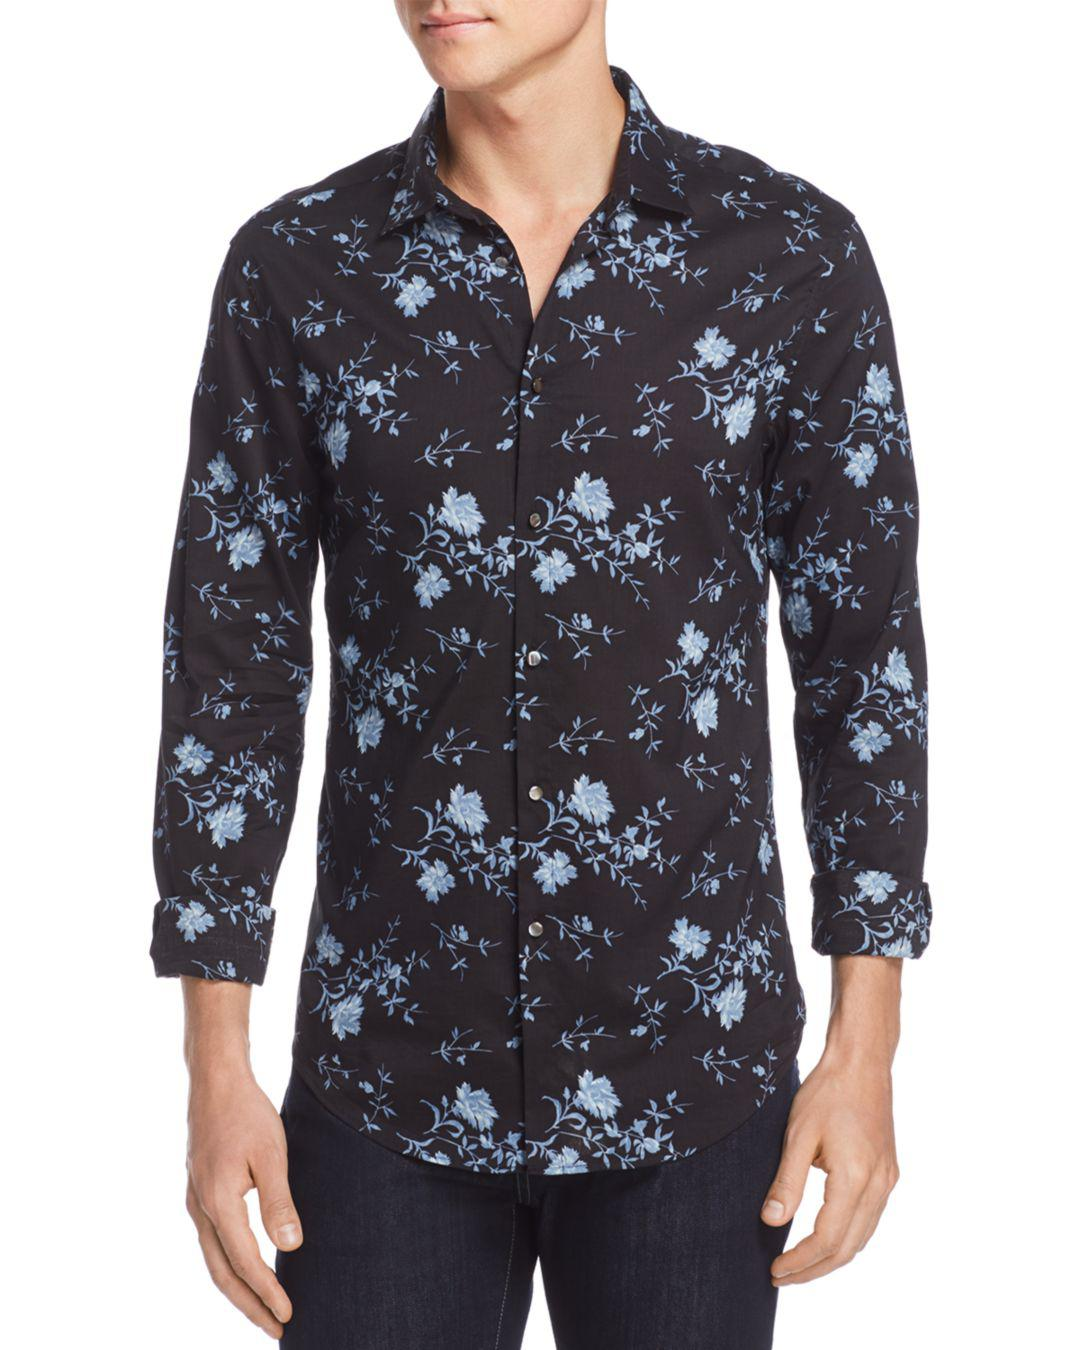 a0f9e2139 Mens Long Sleeve T Shirts 2019 | Greek T Shirt - Part 814